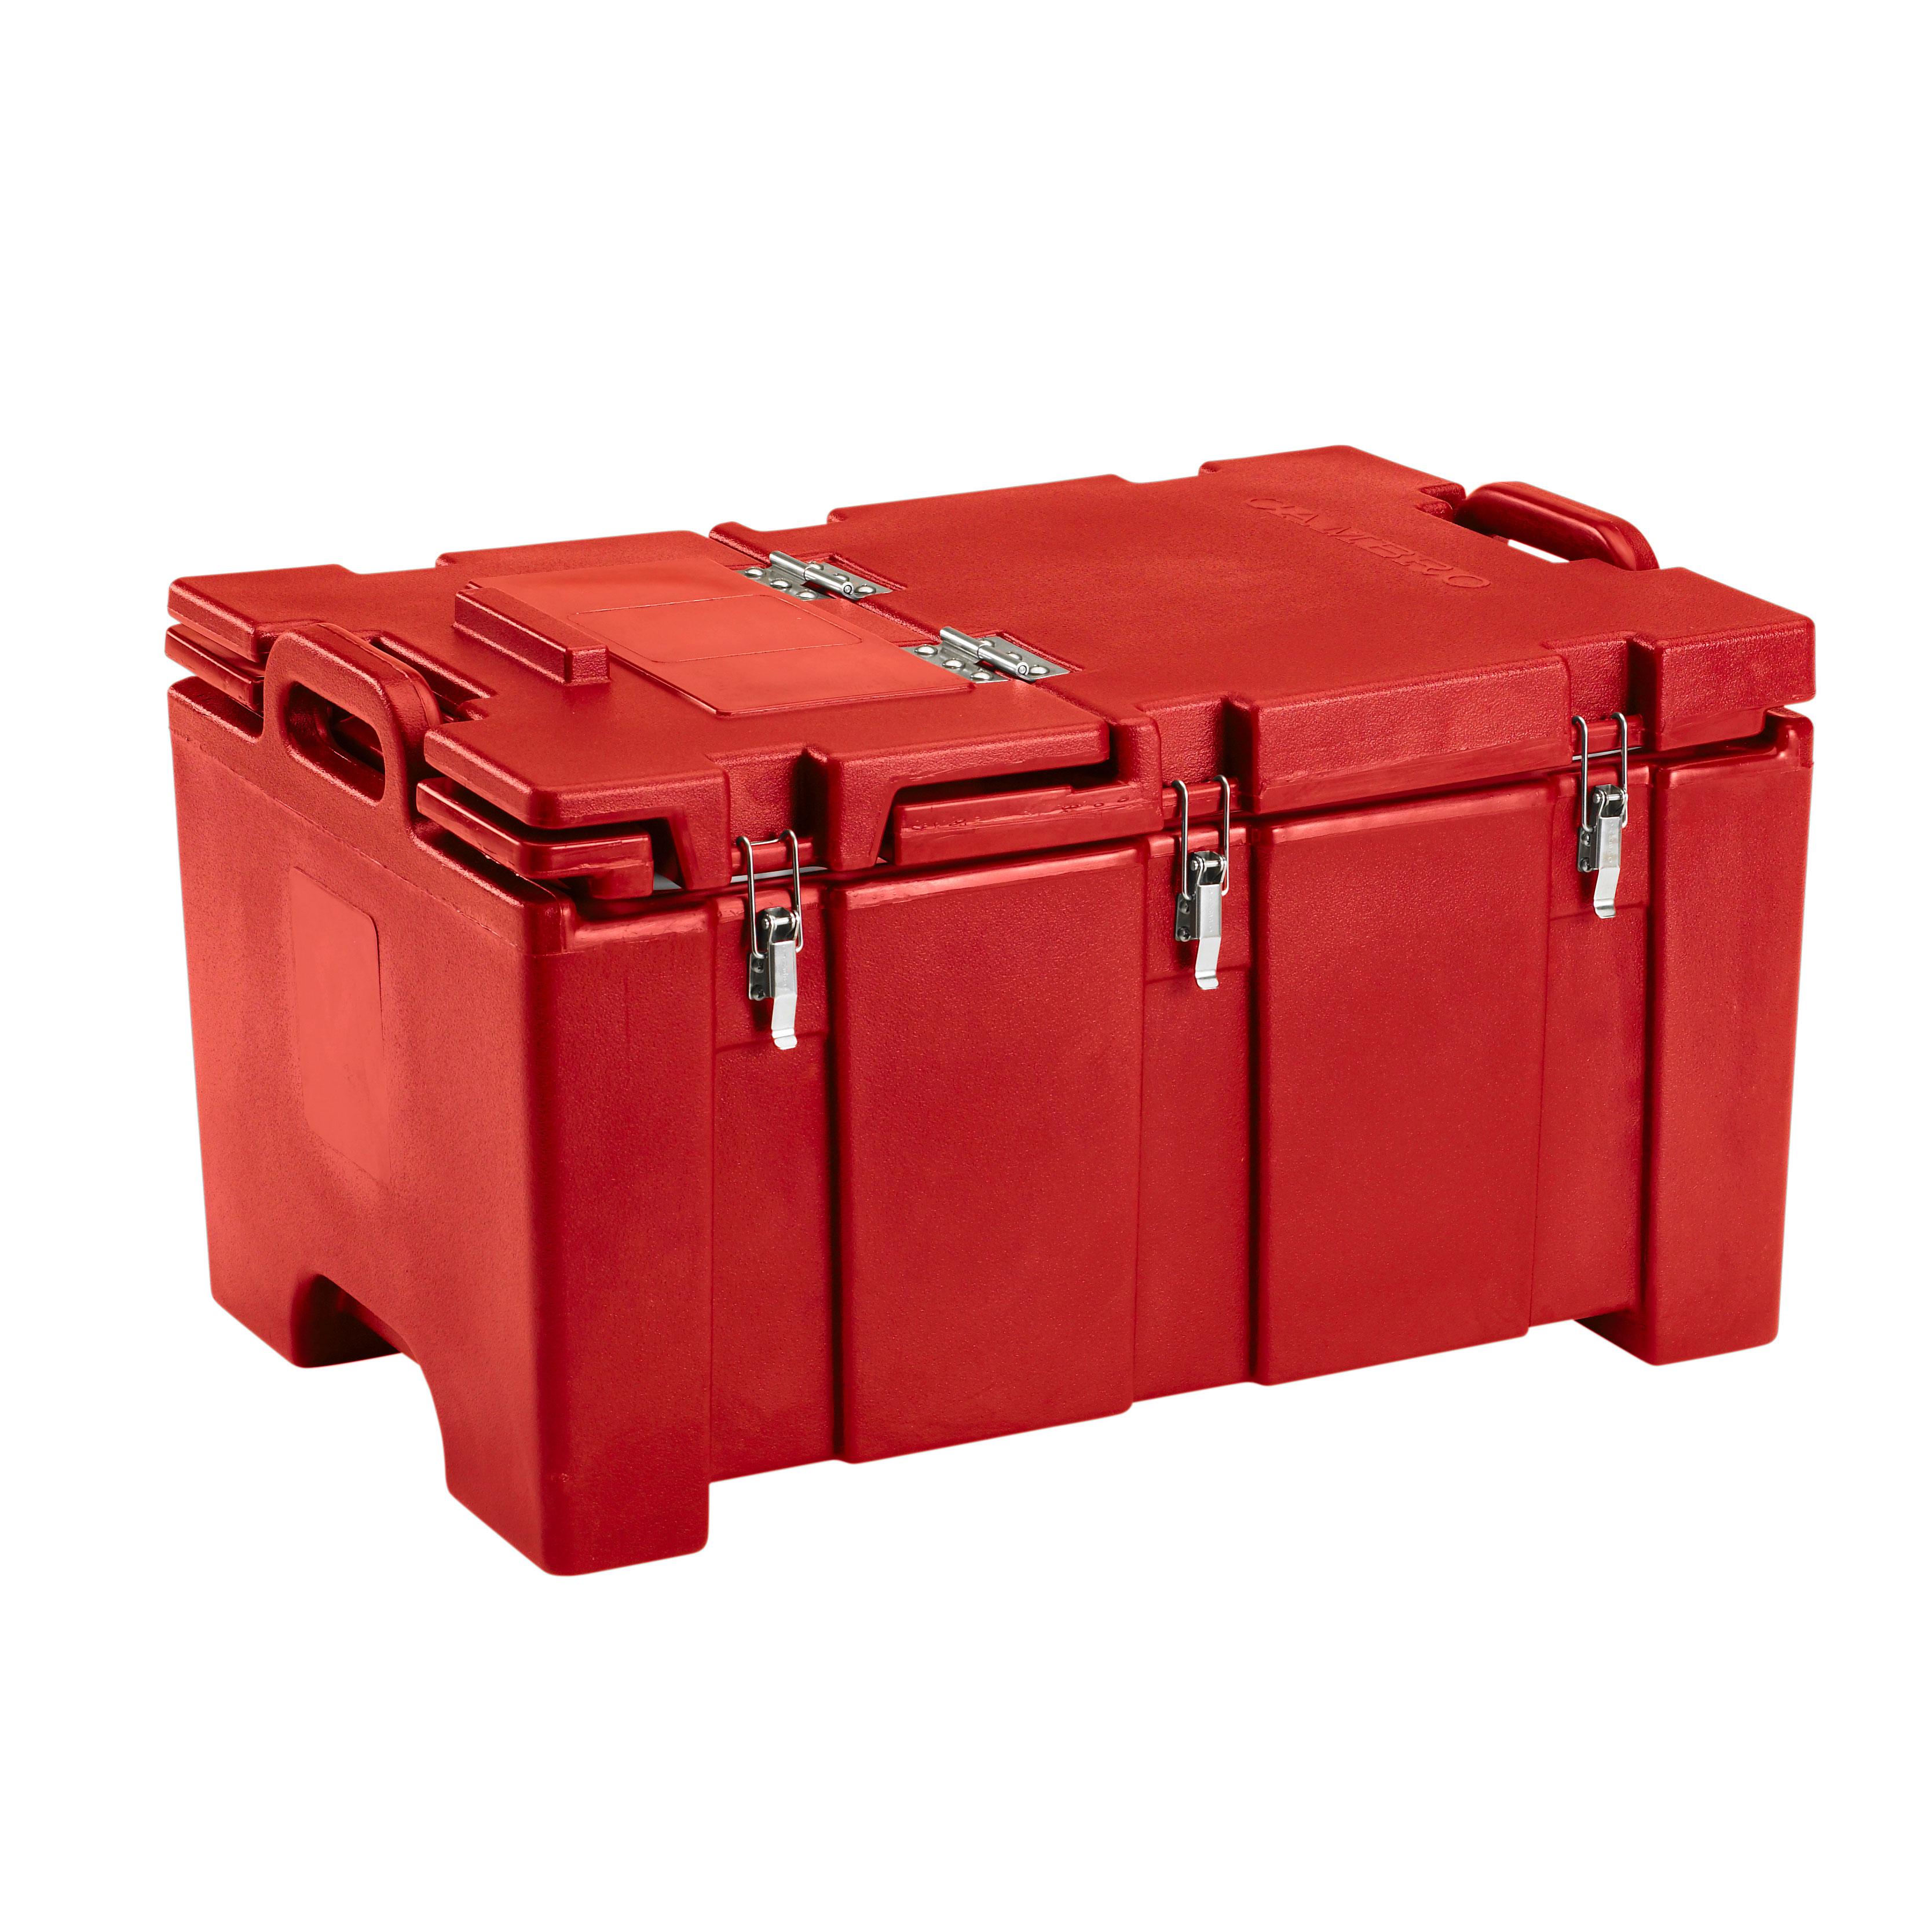 Cambro 100MPCHL158 insulated food storage